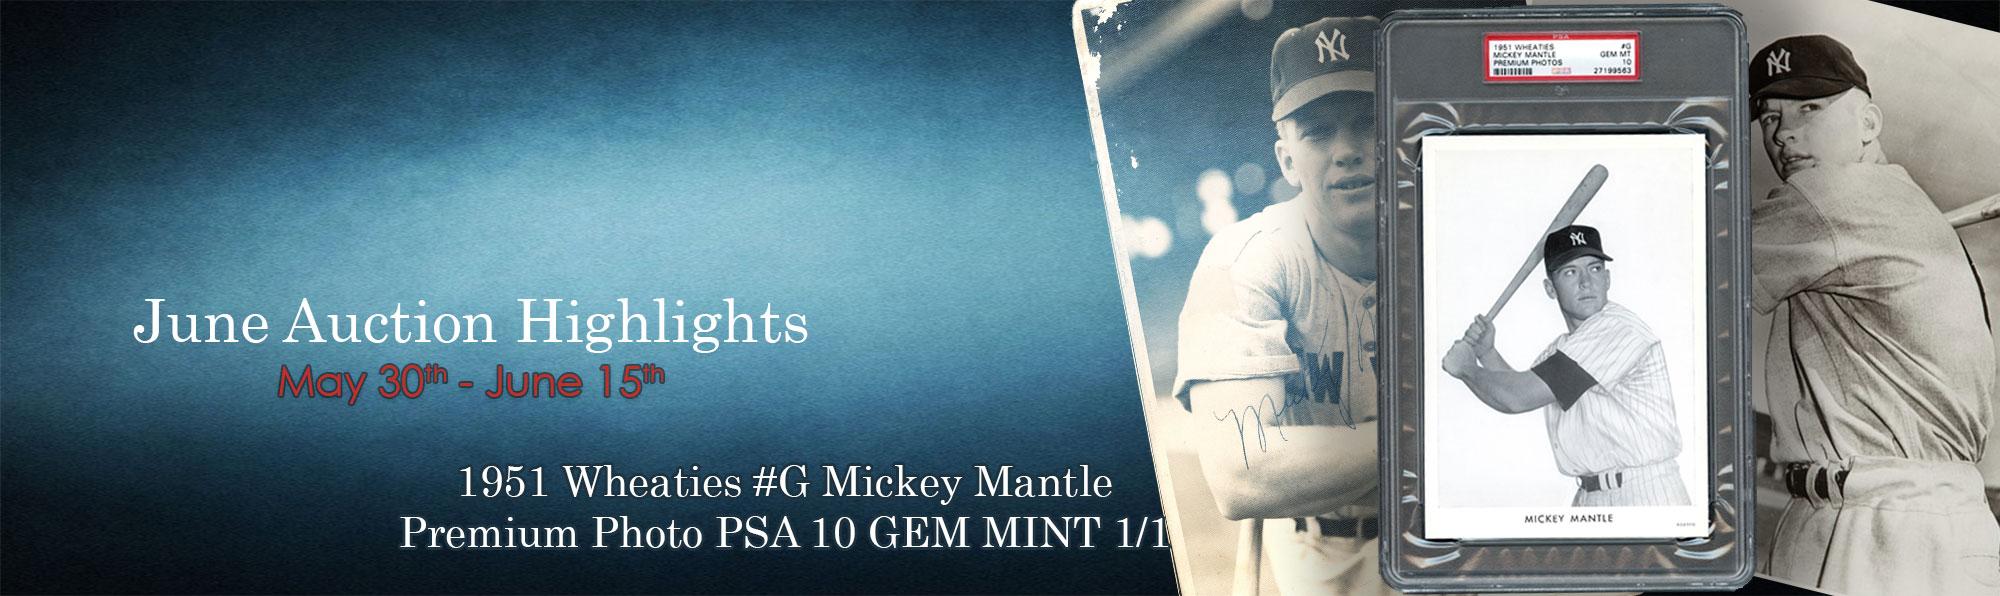 1951 Wheaties #G Mickey Mantle Premium Photo PSA 10 GEM MINT 1/1